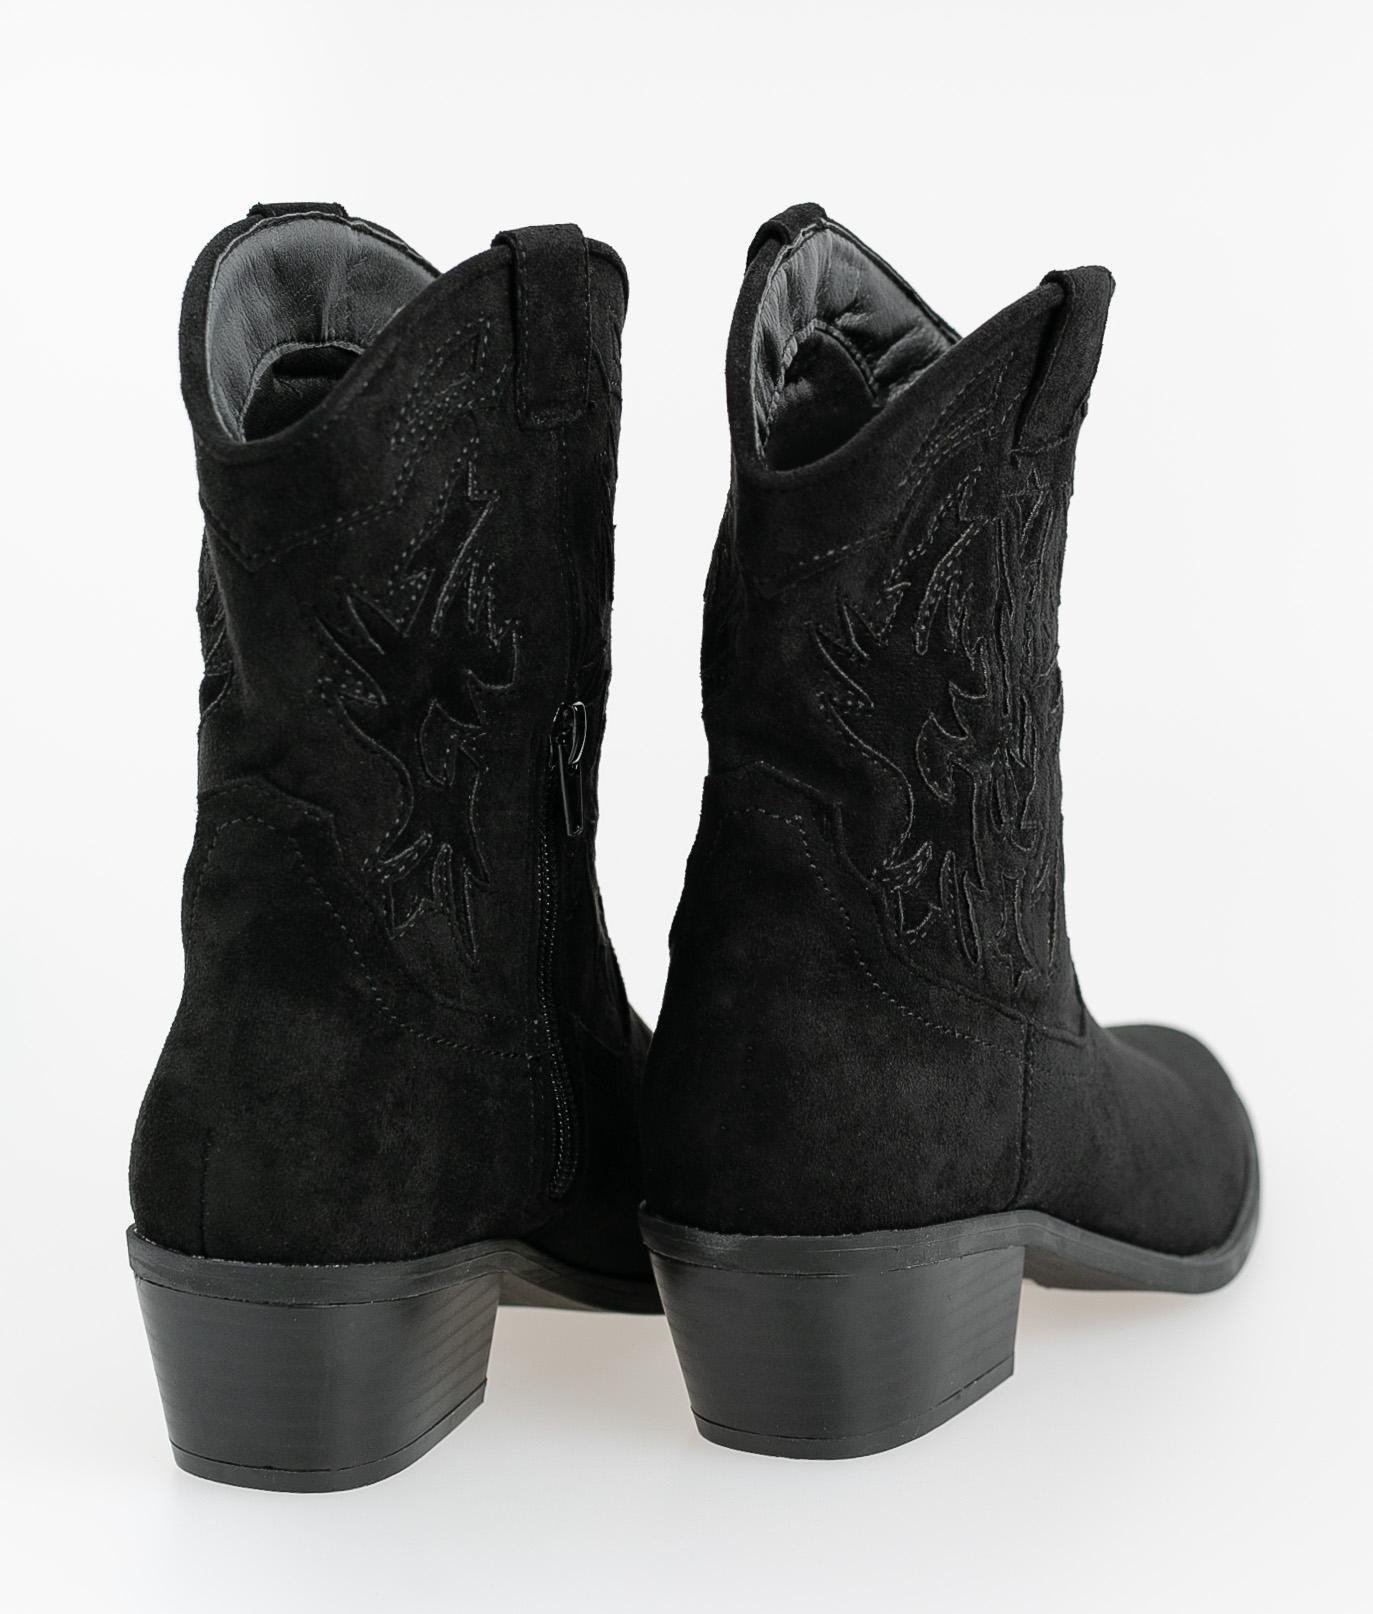 Boot Petite Narobi - Noir